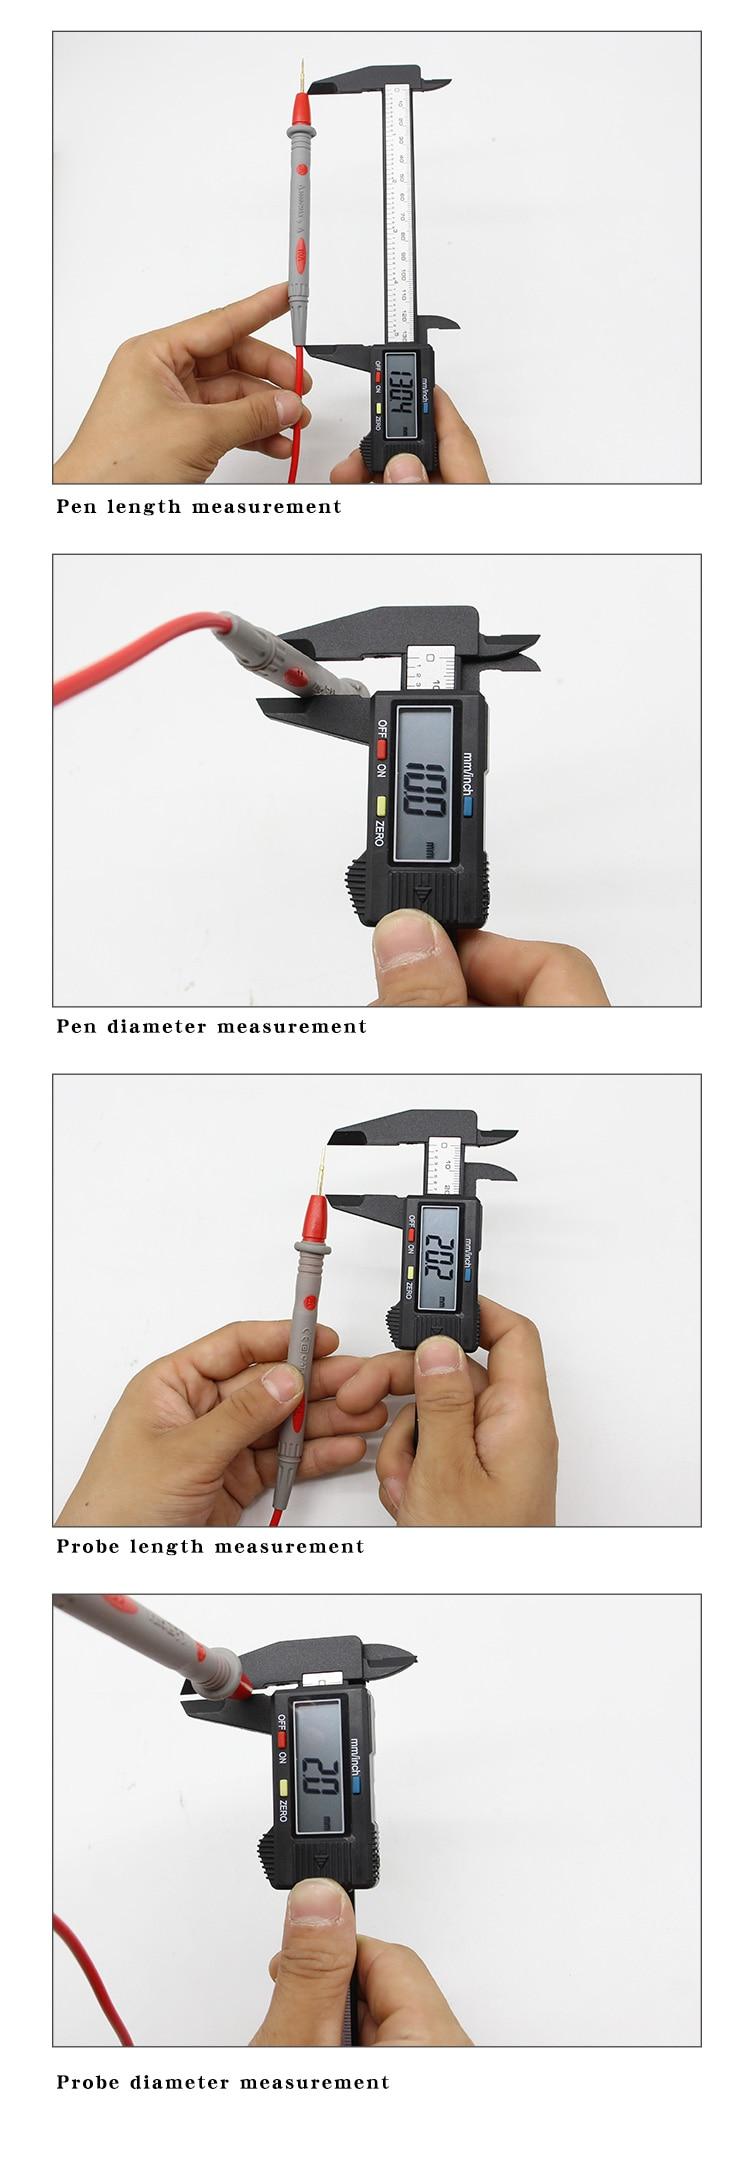 H2388110b0f97414ab4311d7f567862f5c 1Pair Universal Digital 1000V 10A 20A Thin Tip Needle Multimeter Multi Meter Test Lead Probe Wire Pen Cable Multimeter Tester